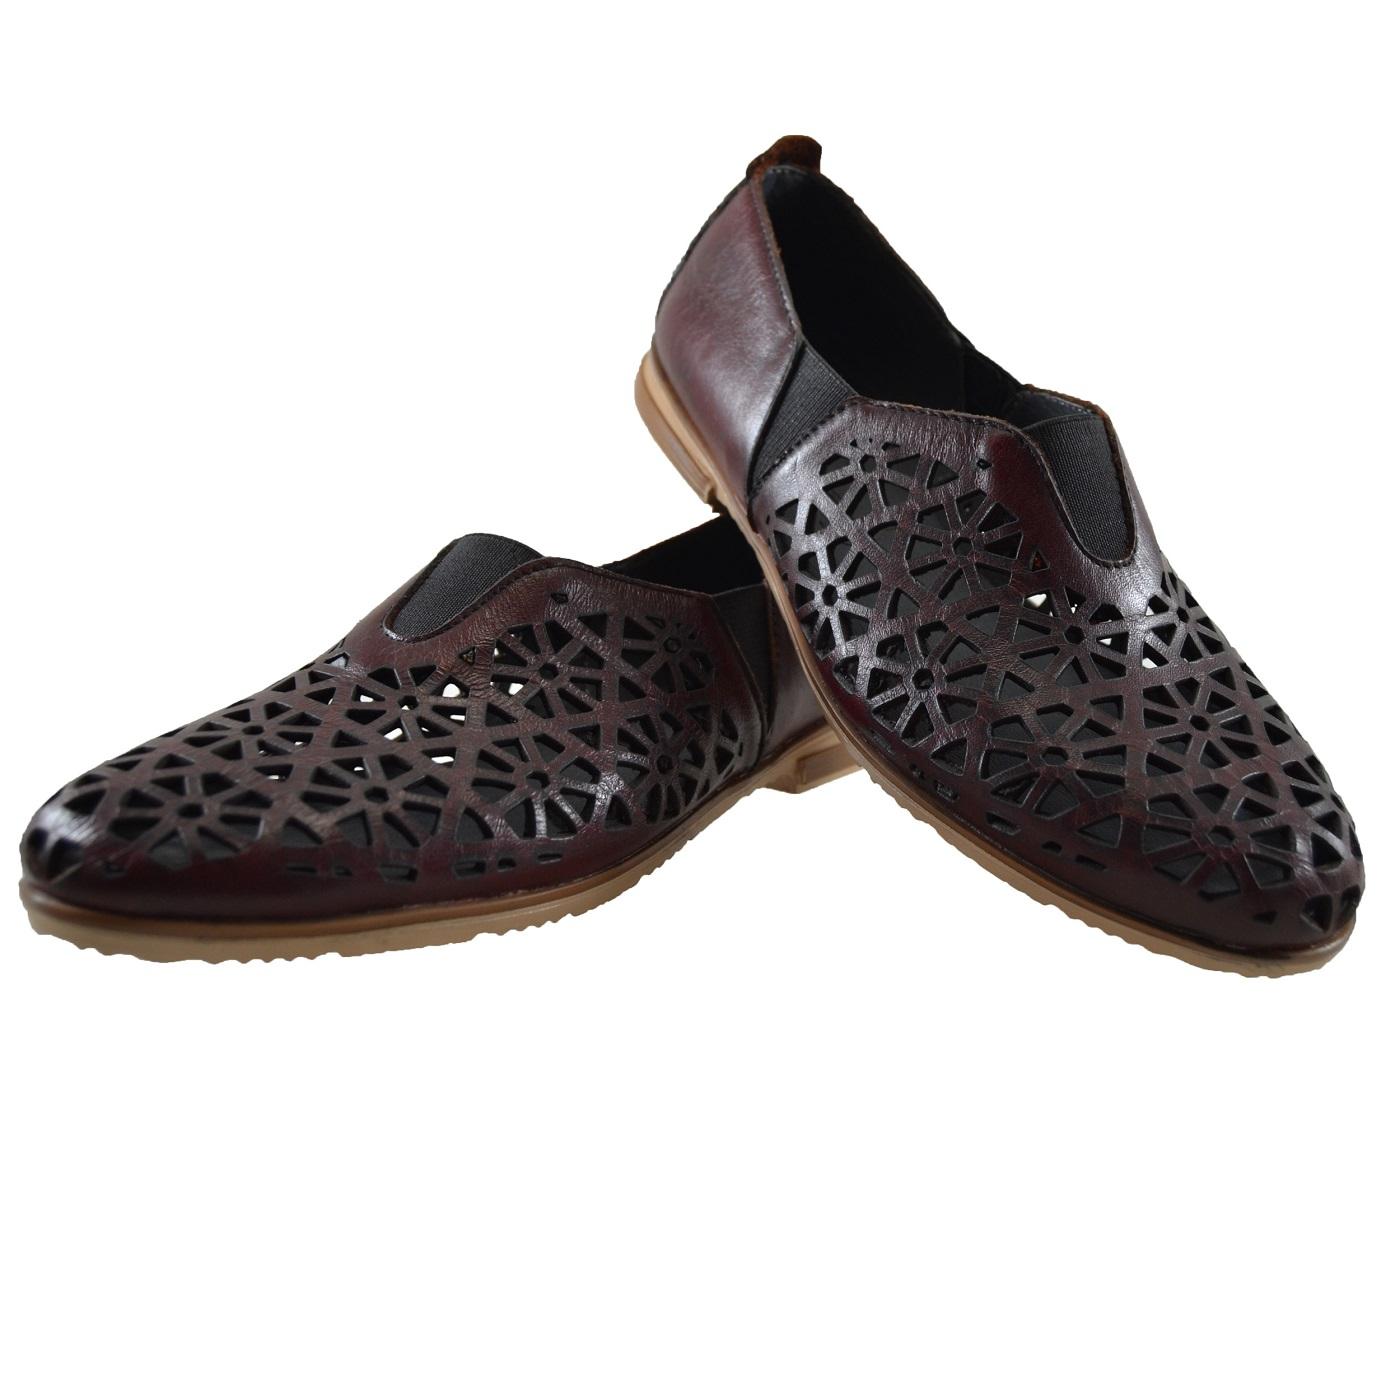 کفش زنانه کد 519 -  - 3